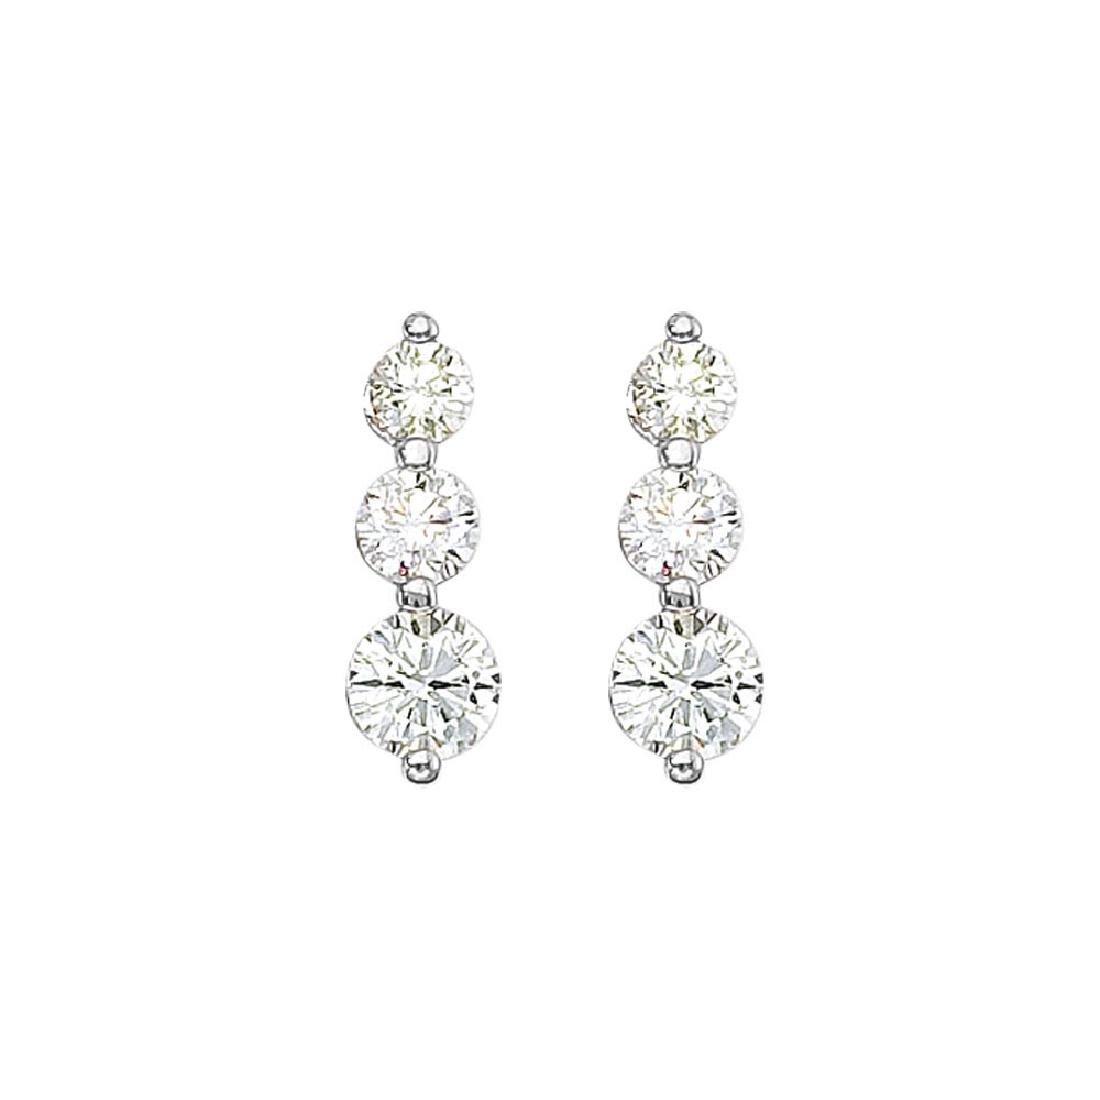 Certified 14k White Gold 2 ct 3 Stone Diamond Earring